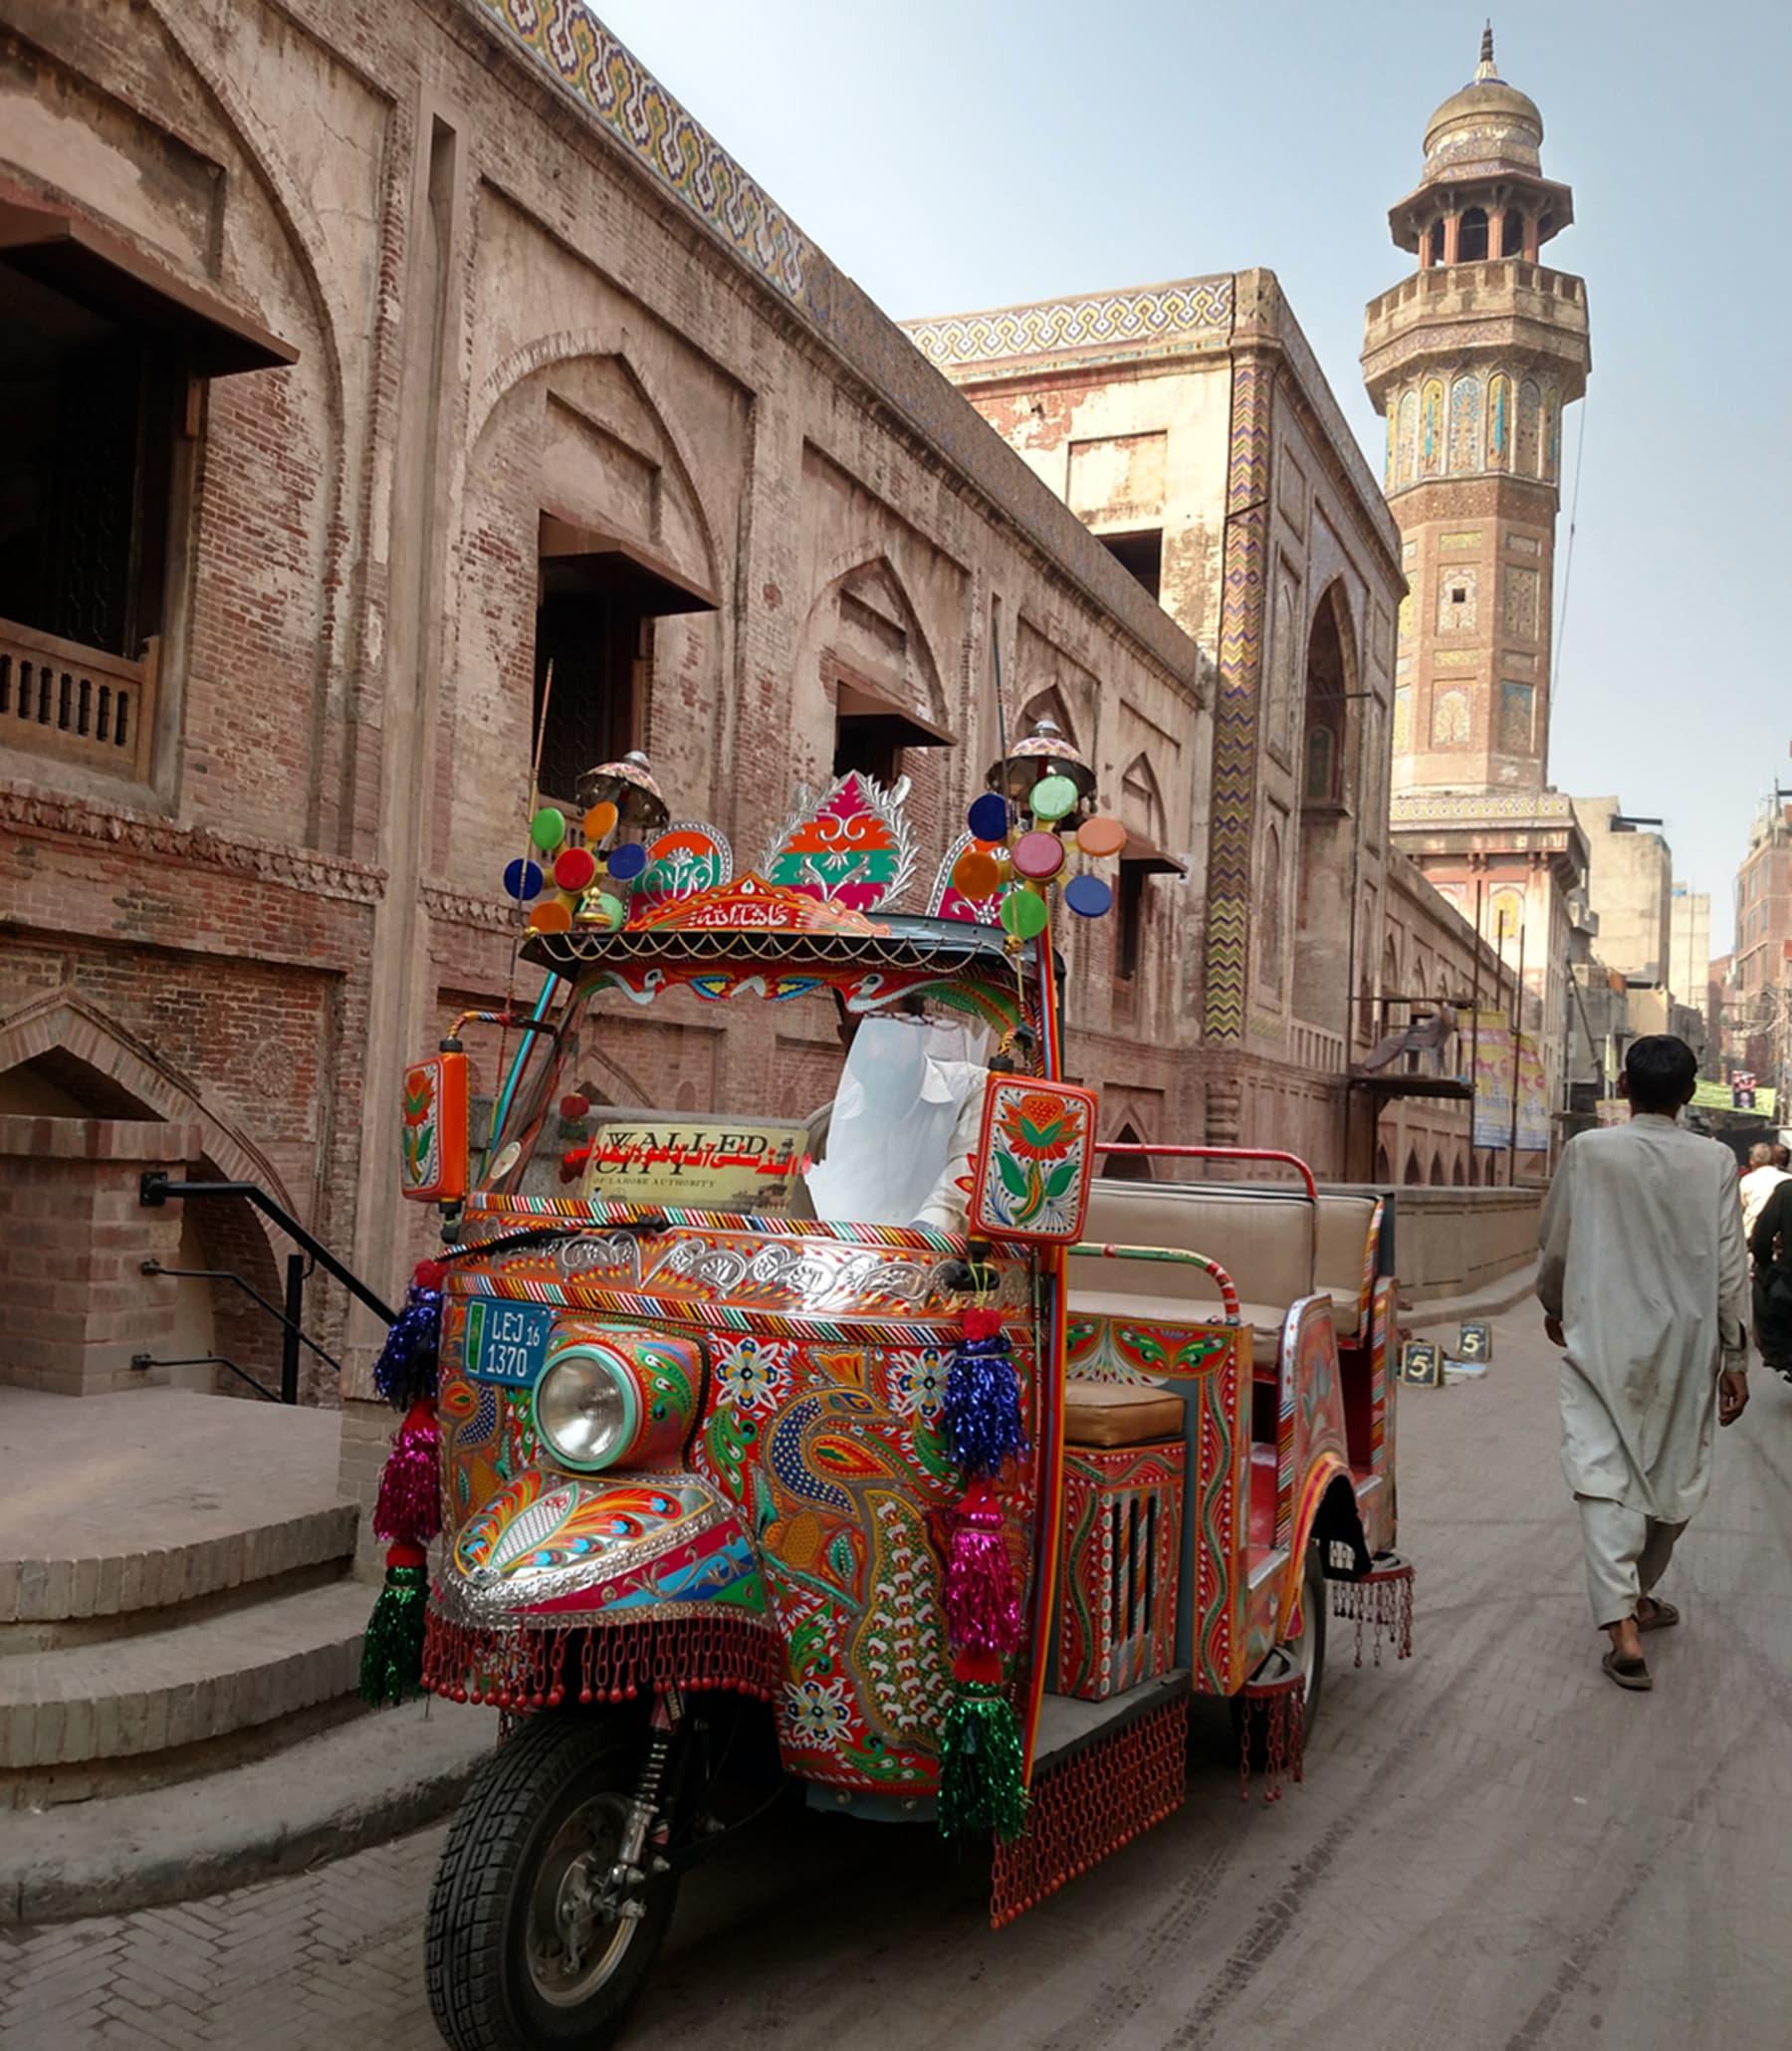 اندرون شہر لاہور—تصویر عبیداللہ کیہر